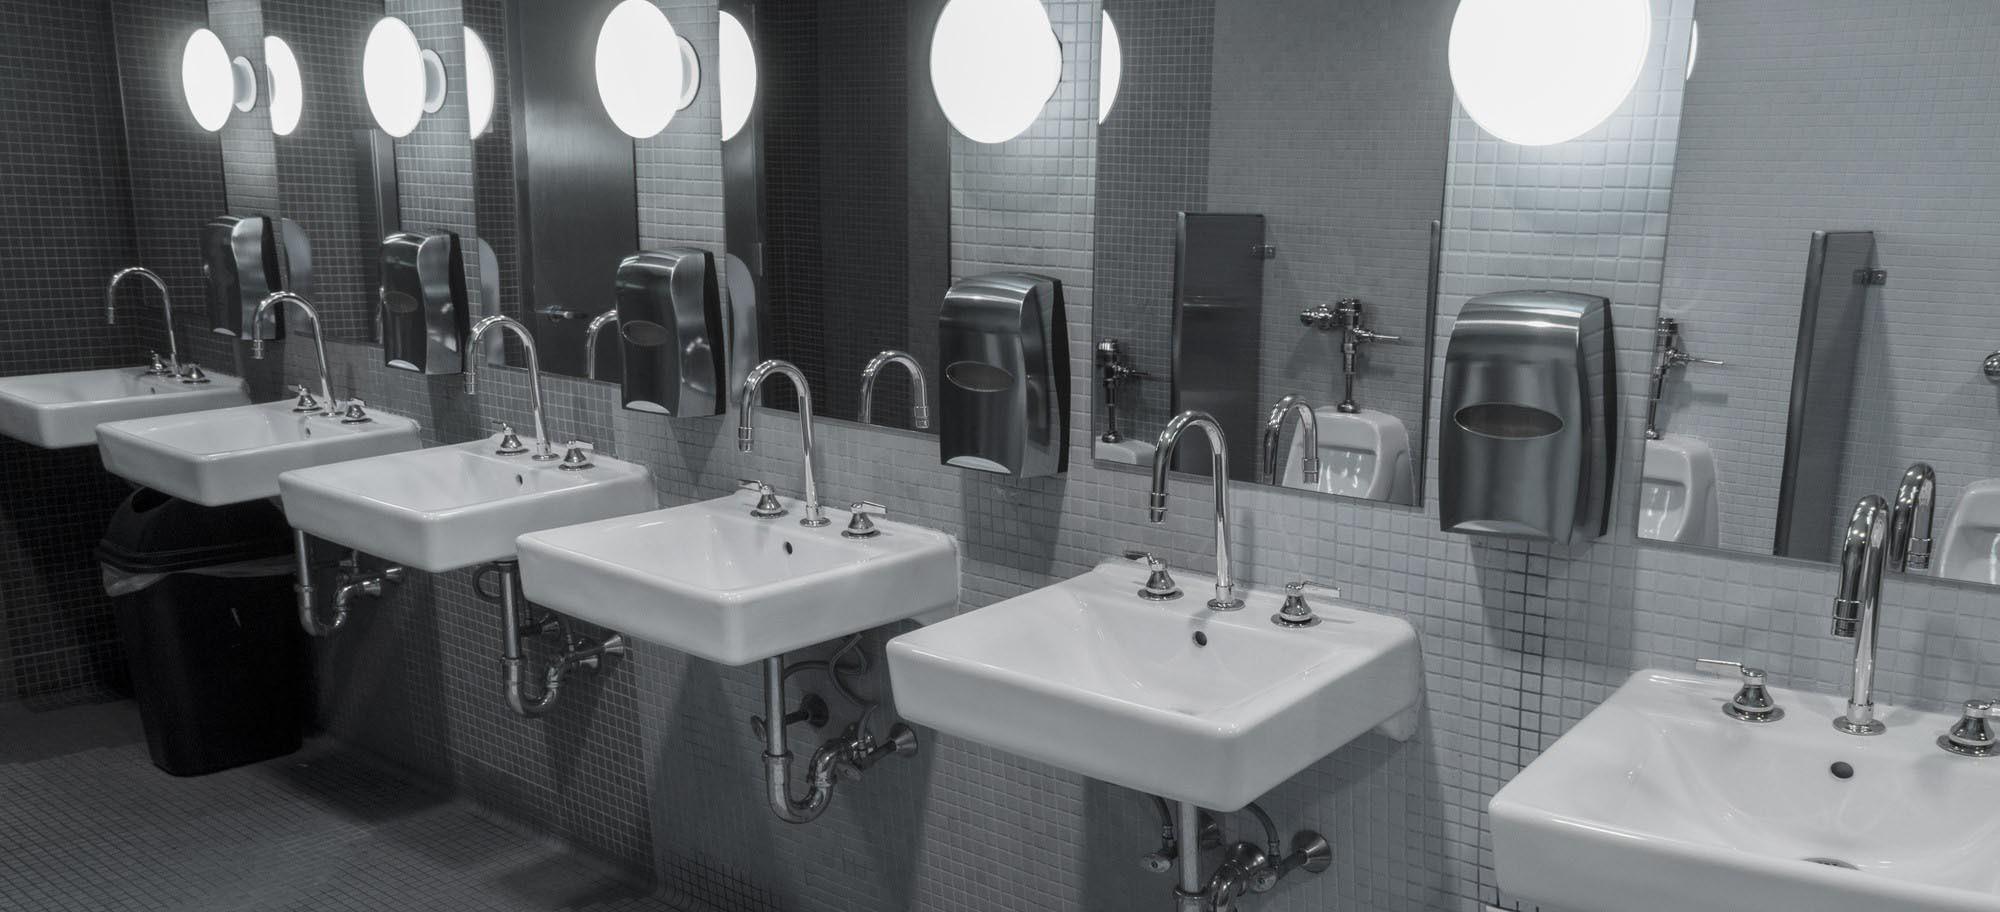 Washroom Accessories. Wholesale Toilet Partitions  School Lockers   Canadian Washroom